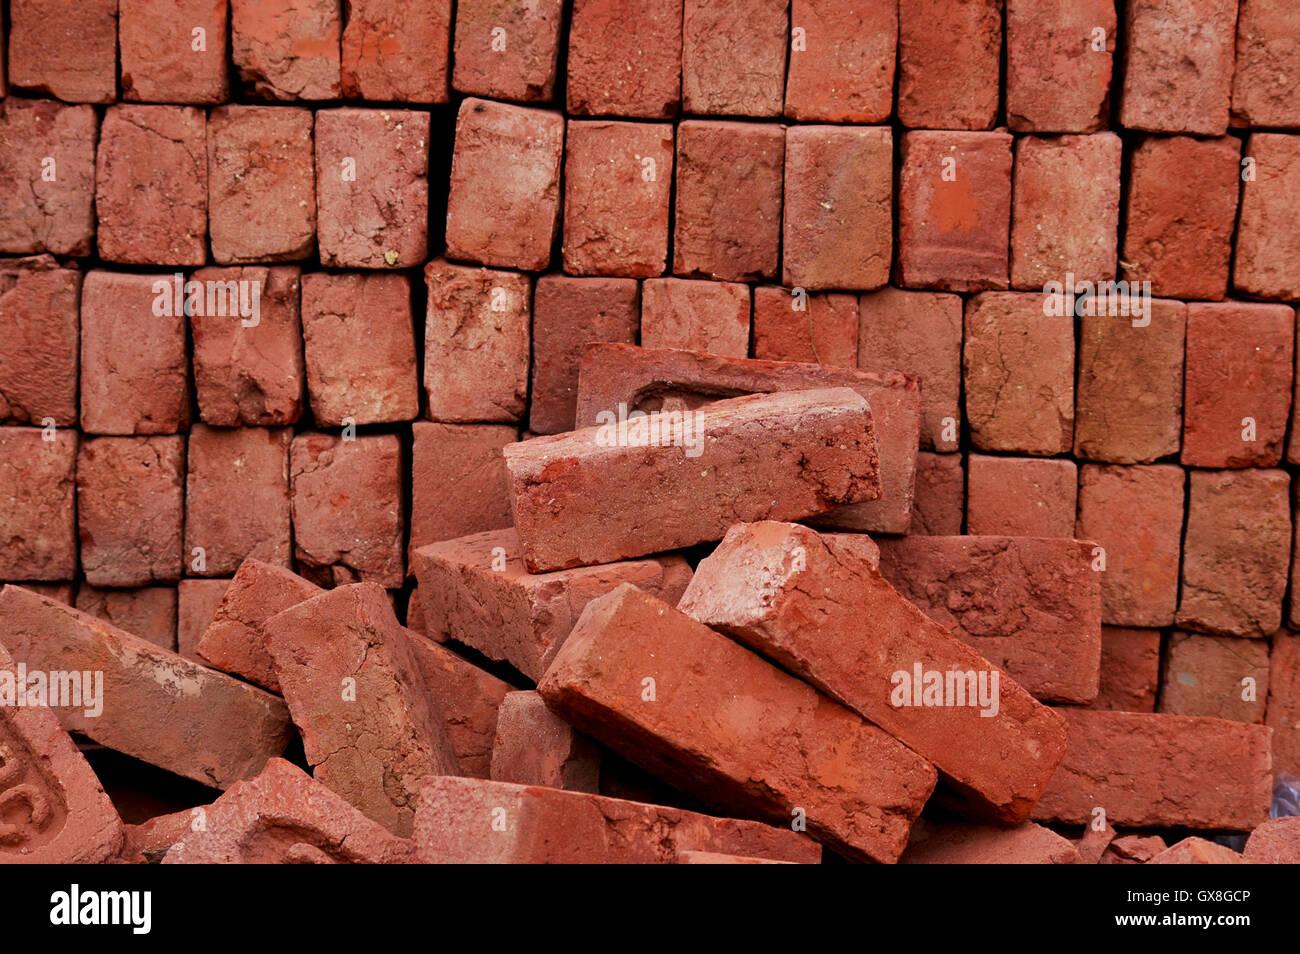 Red Brick - Stock Image